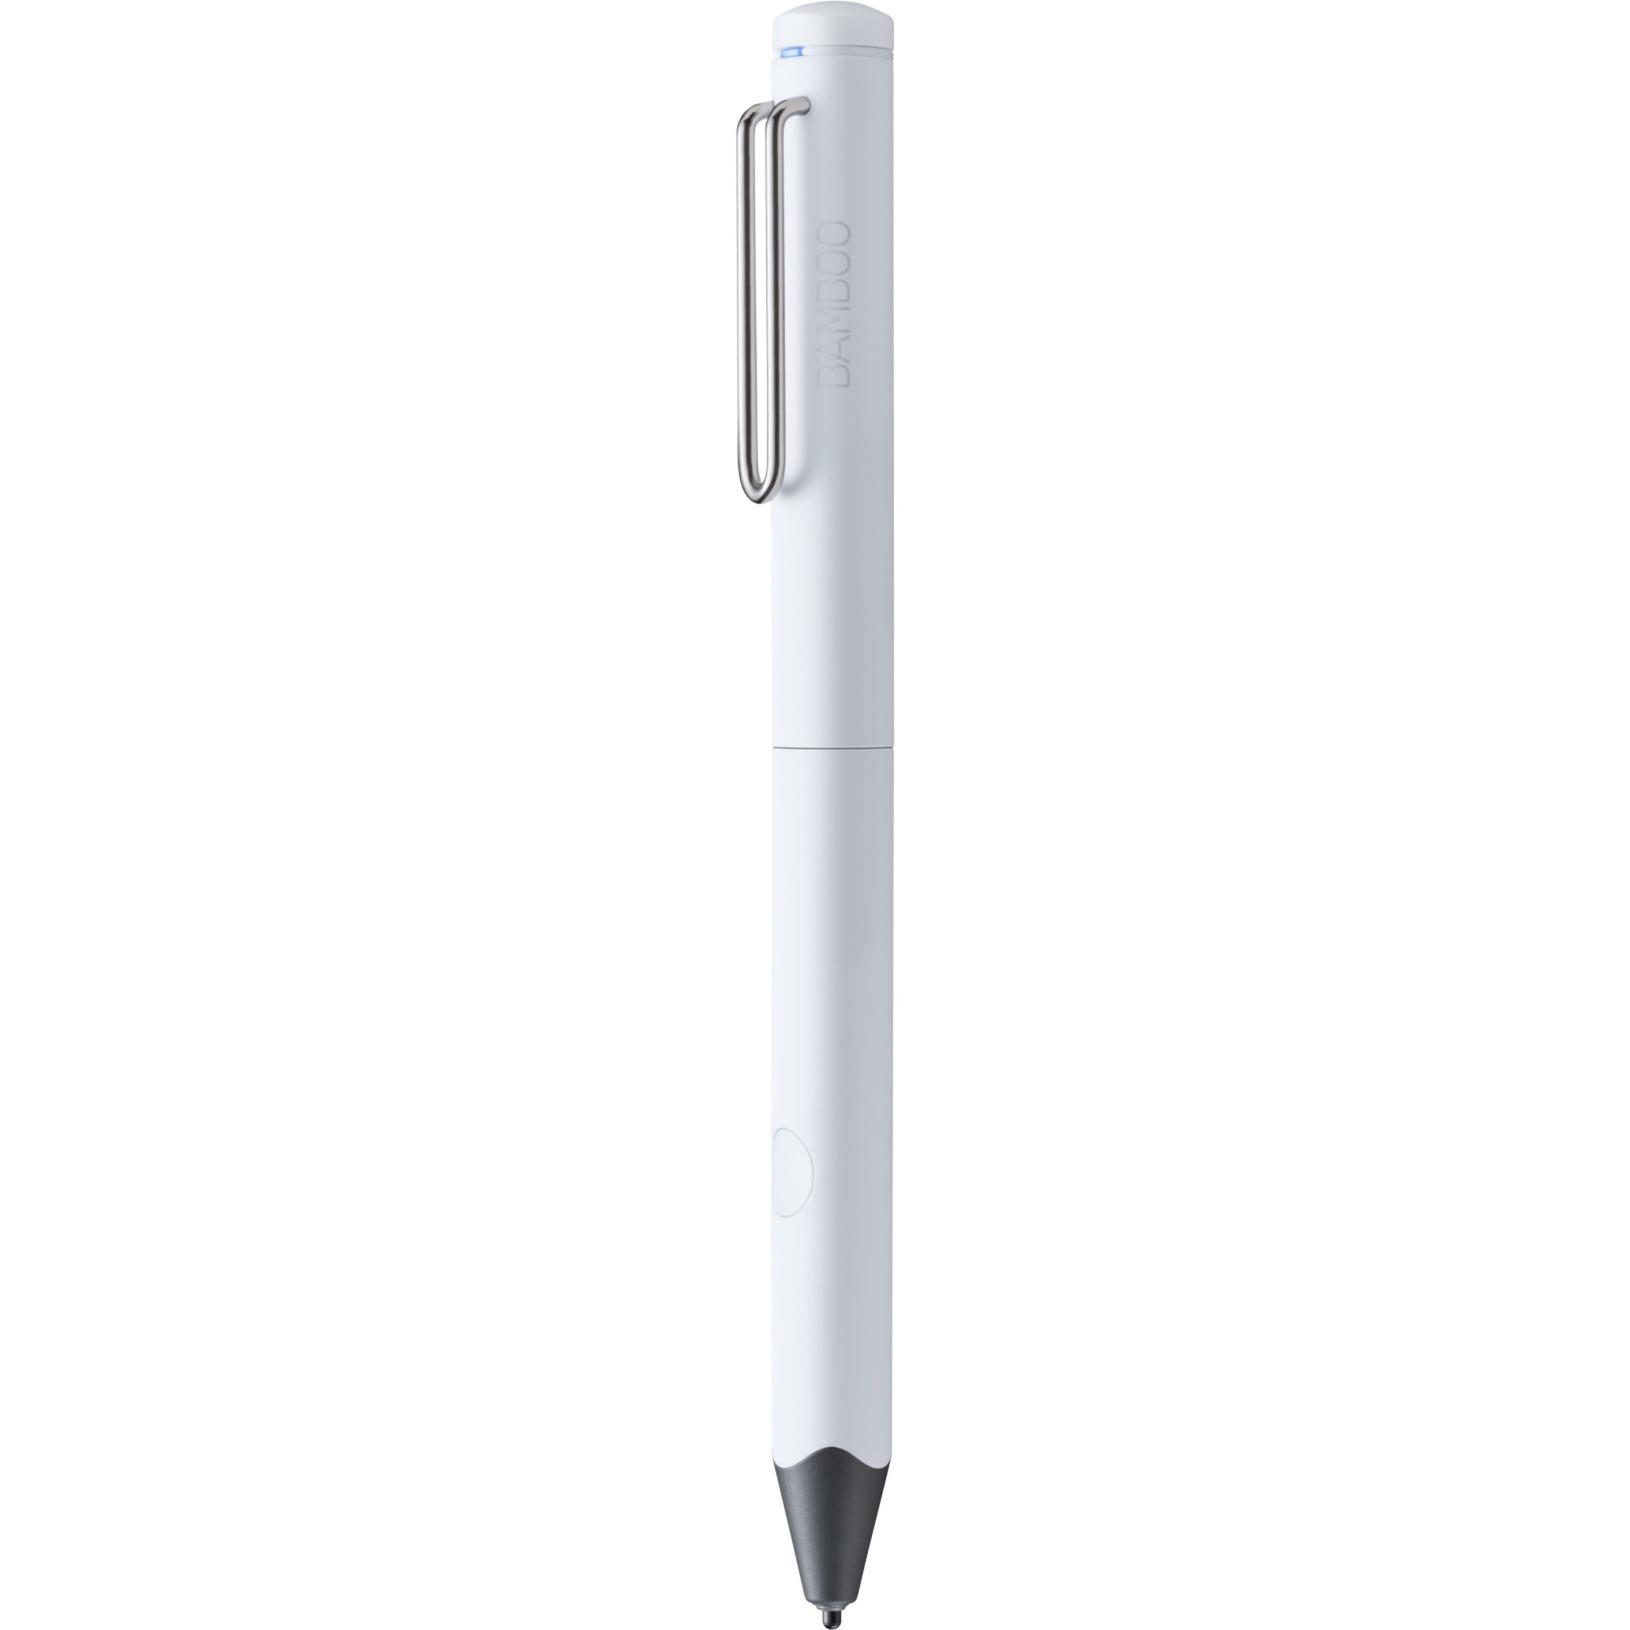 Bamboo Fineline 3 18g Blanco lápiz digital, Bolígrafo para pantallas